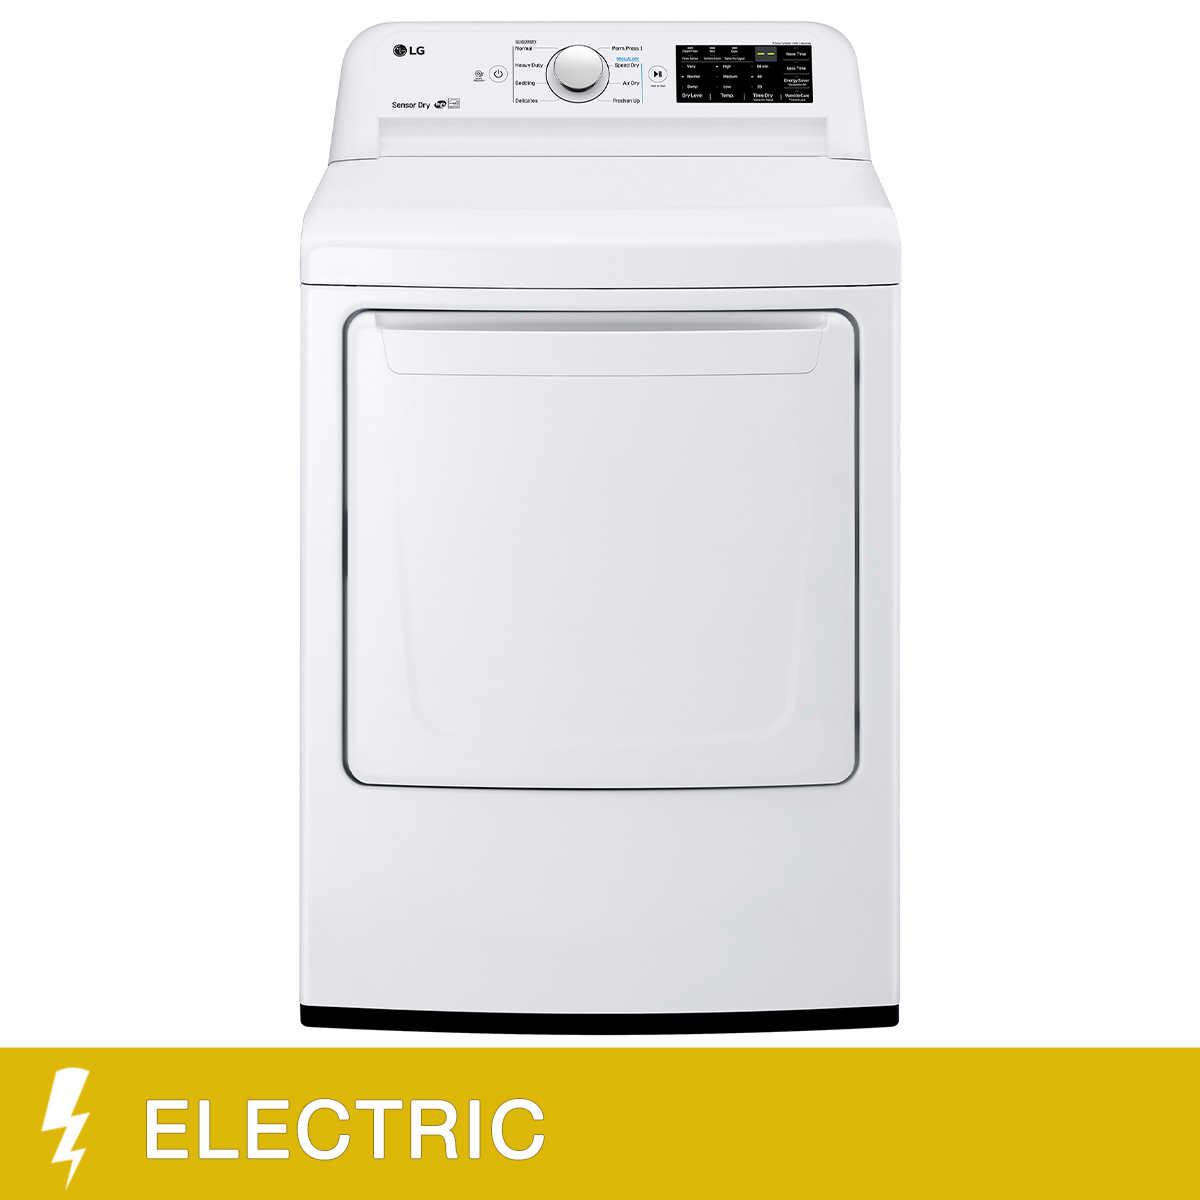 LG 7 3 cu ft Front Load Dryer with Sensor Dry System